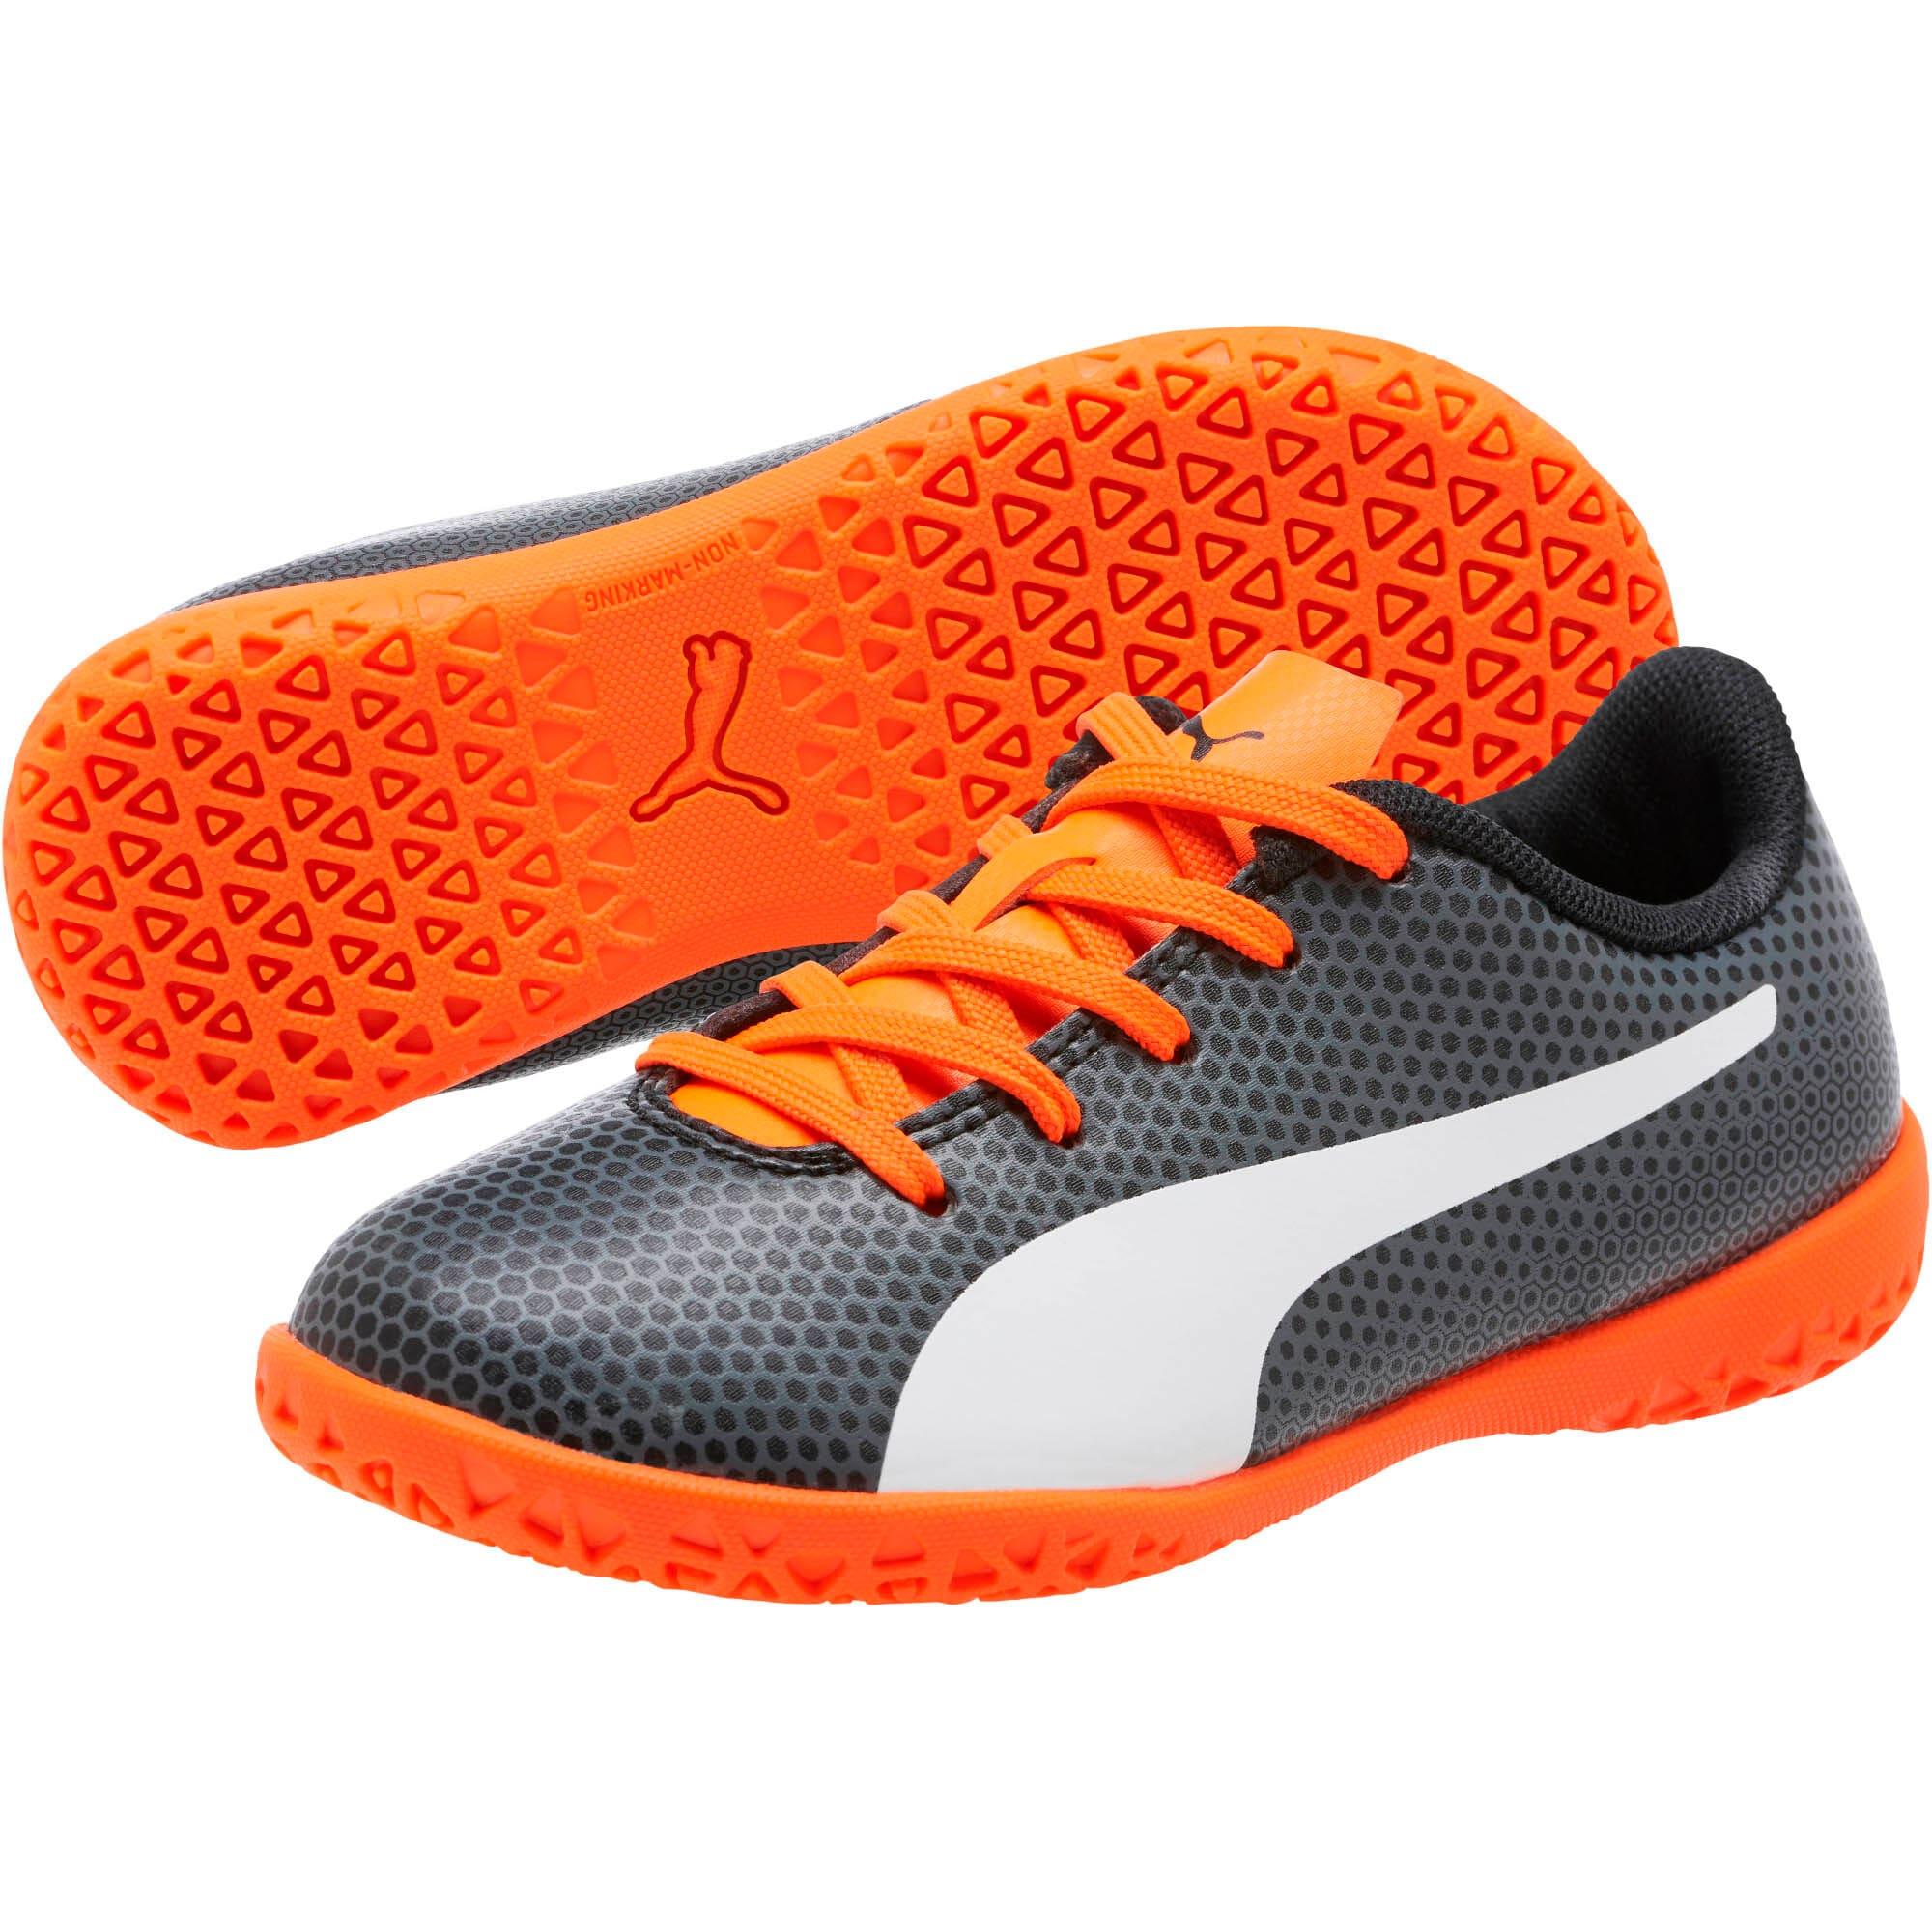 Thumbnail 2 of PUMA Spirit IT Soccer Shoes JR, Black-White-Orange, medium